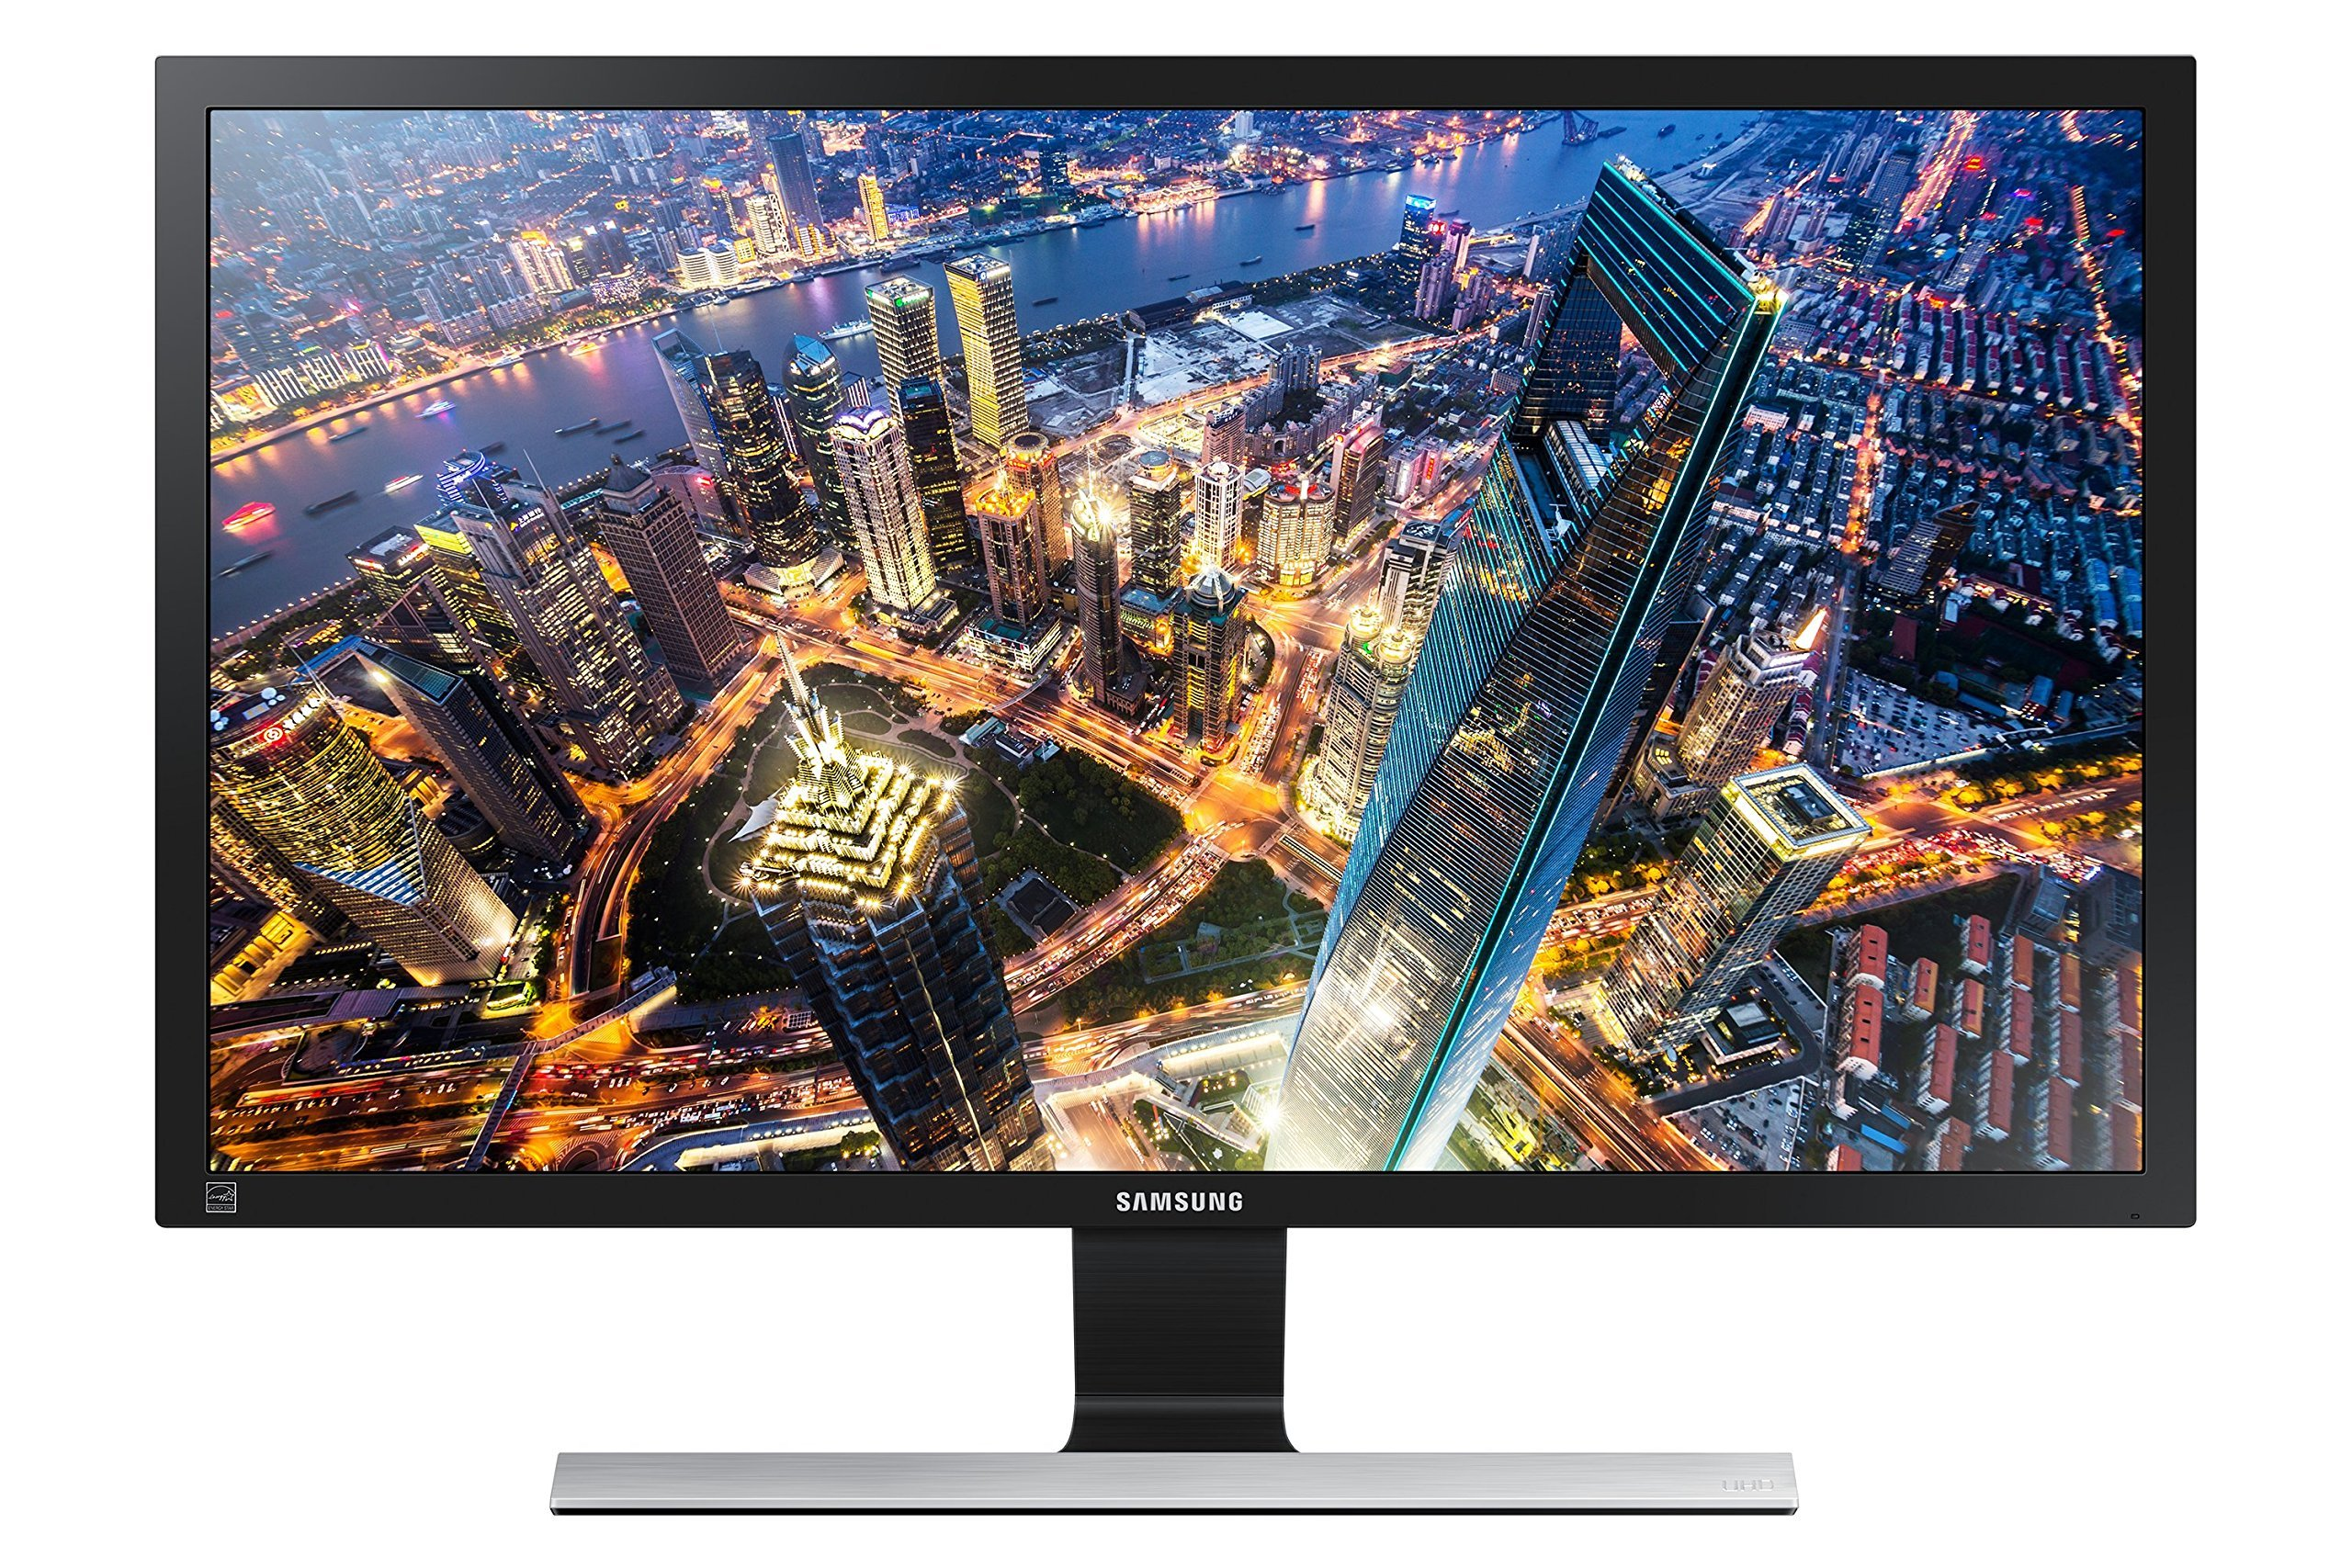 Samsung U28E590D Écran PC 28 pouces (71.09 cm) (UHD 3840 x 2160, 1ms, 16:9, 2xHDMI/DisplayPort, AMD FreeSync) product image